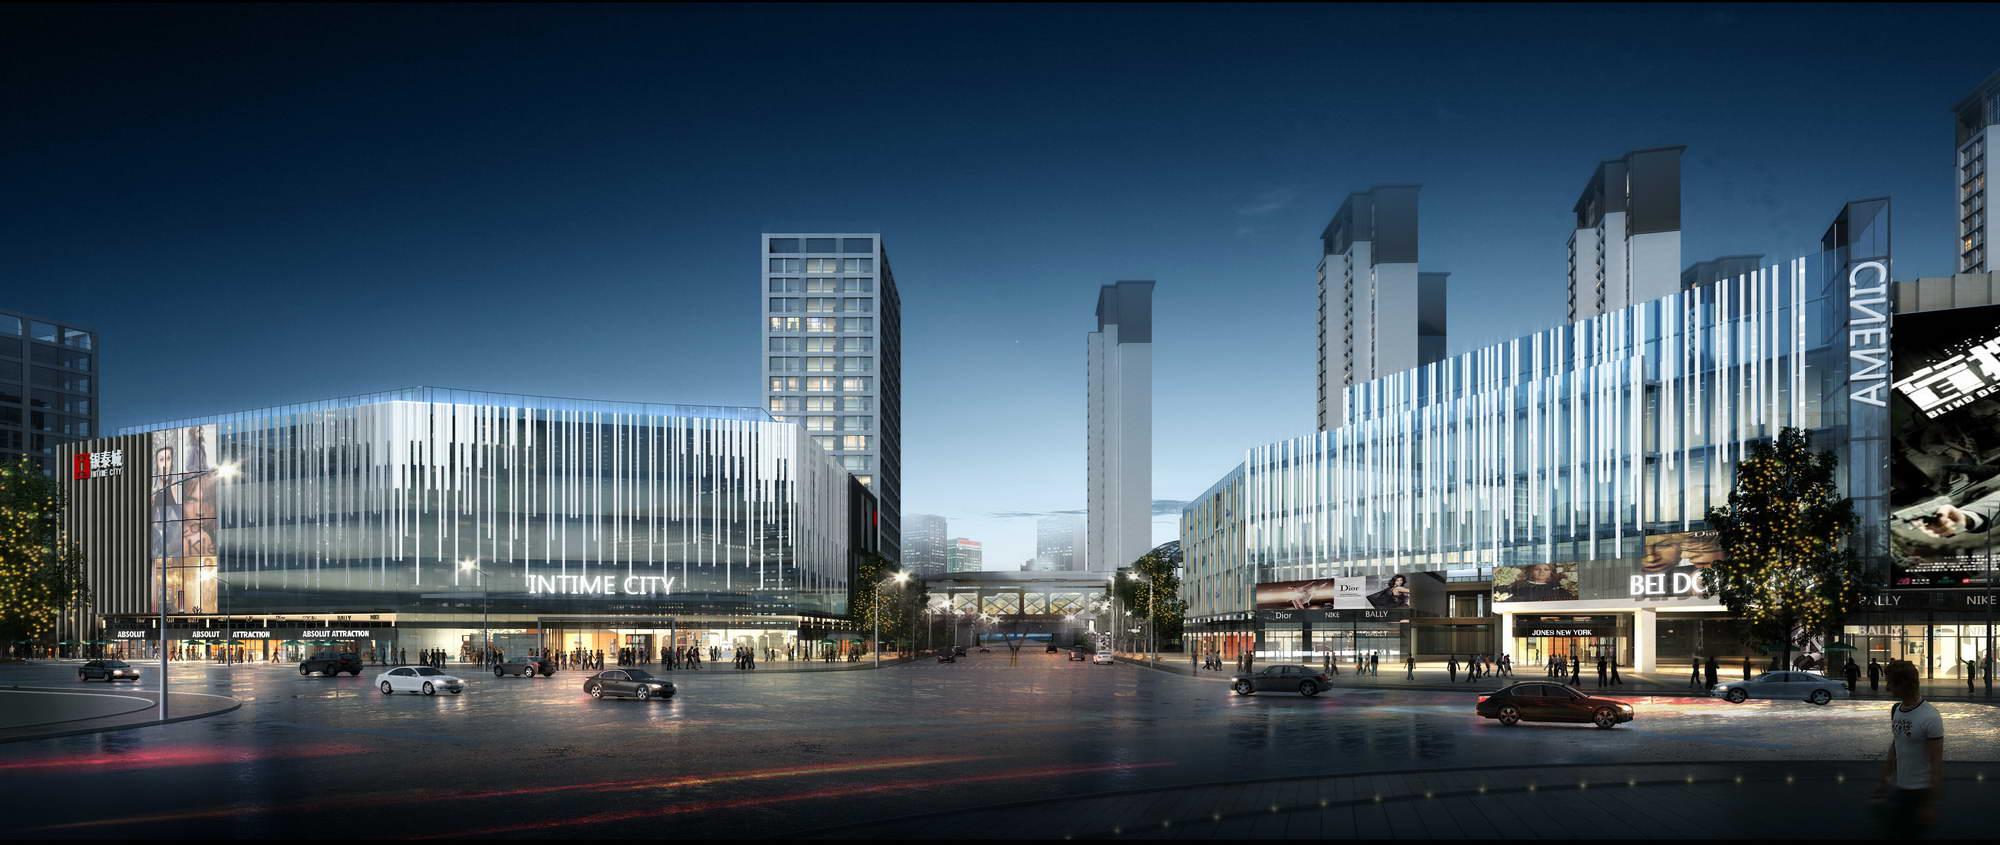 city shopping mall 005 3d model max 206774